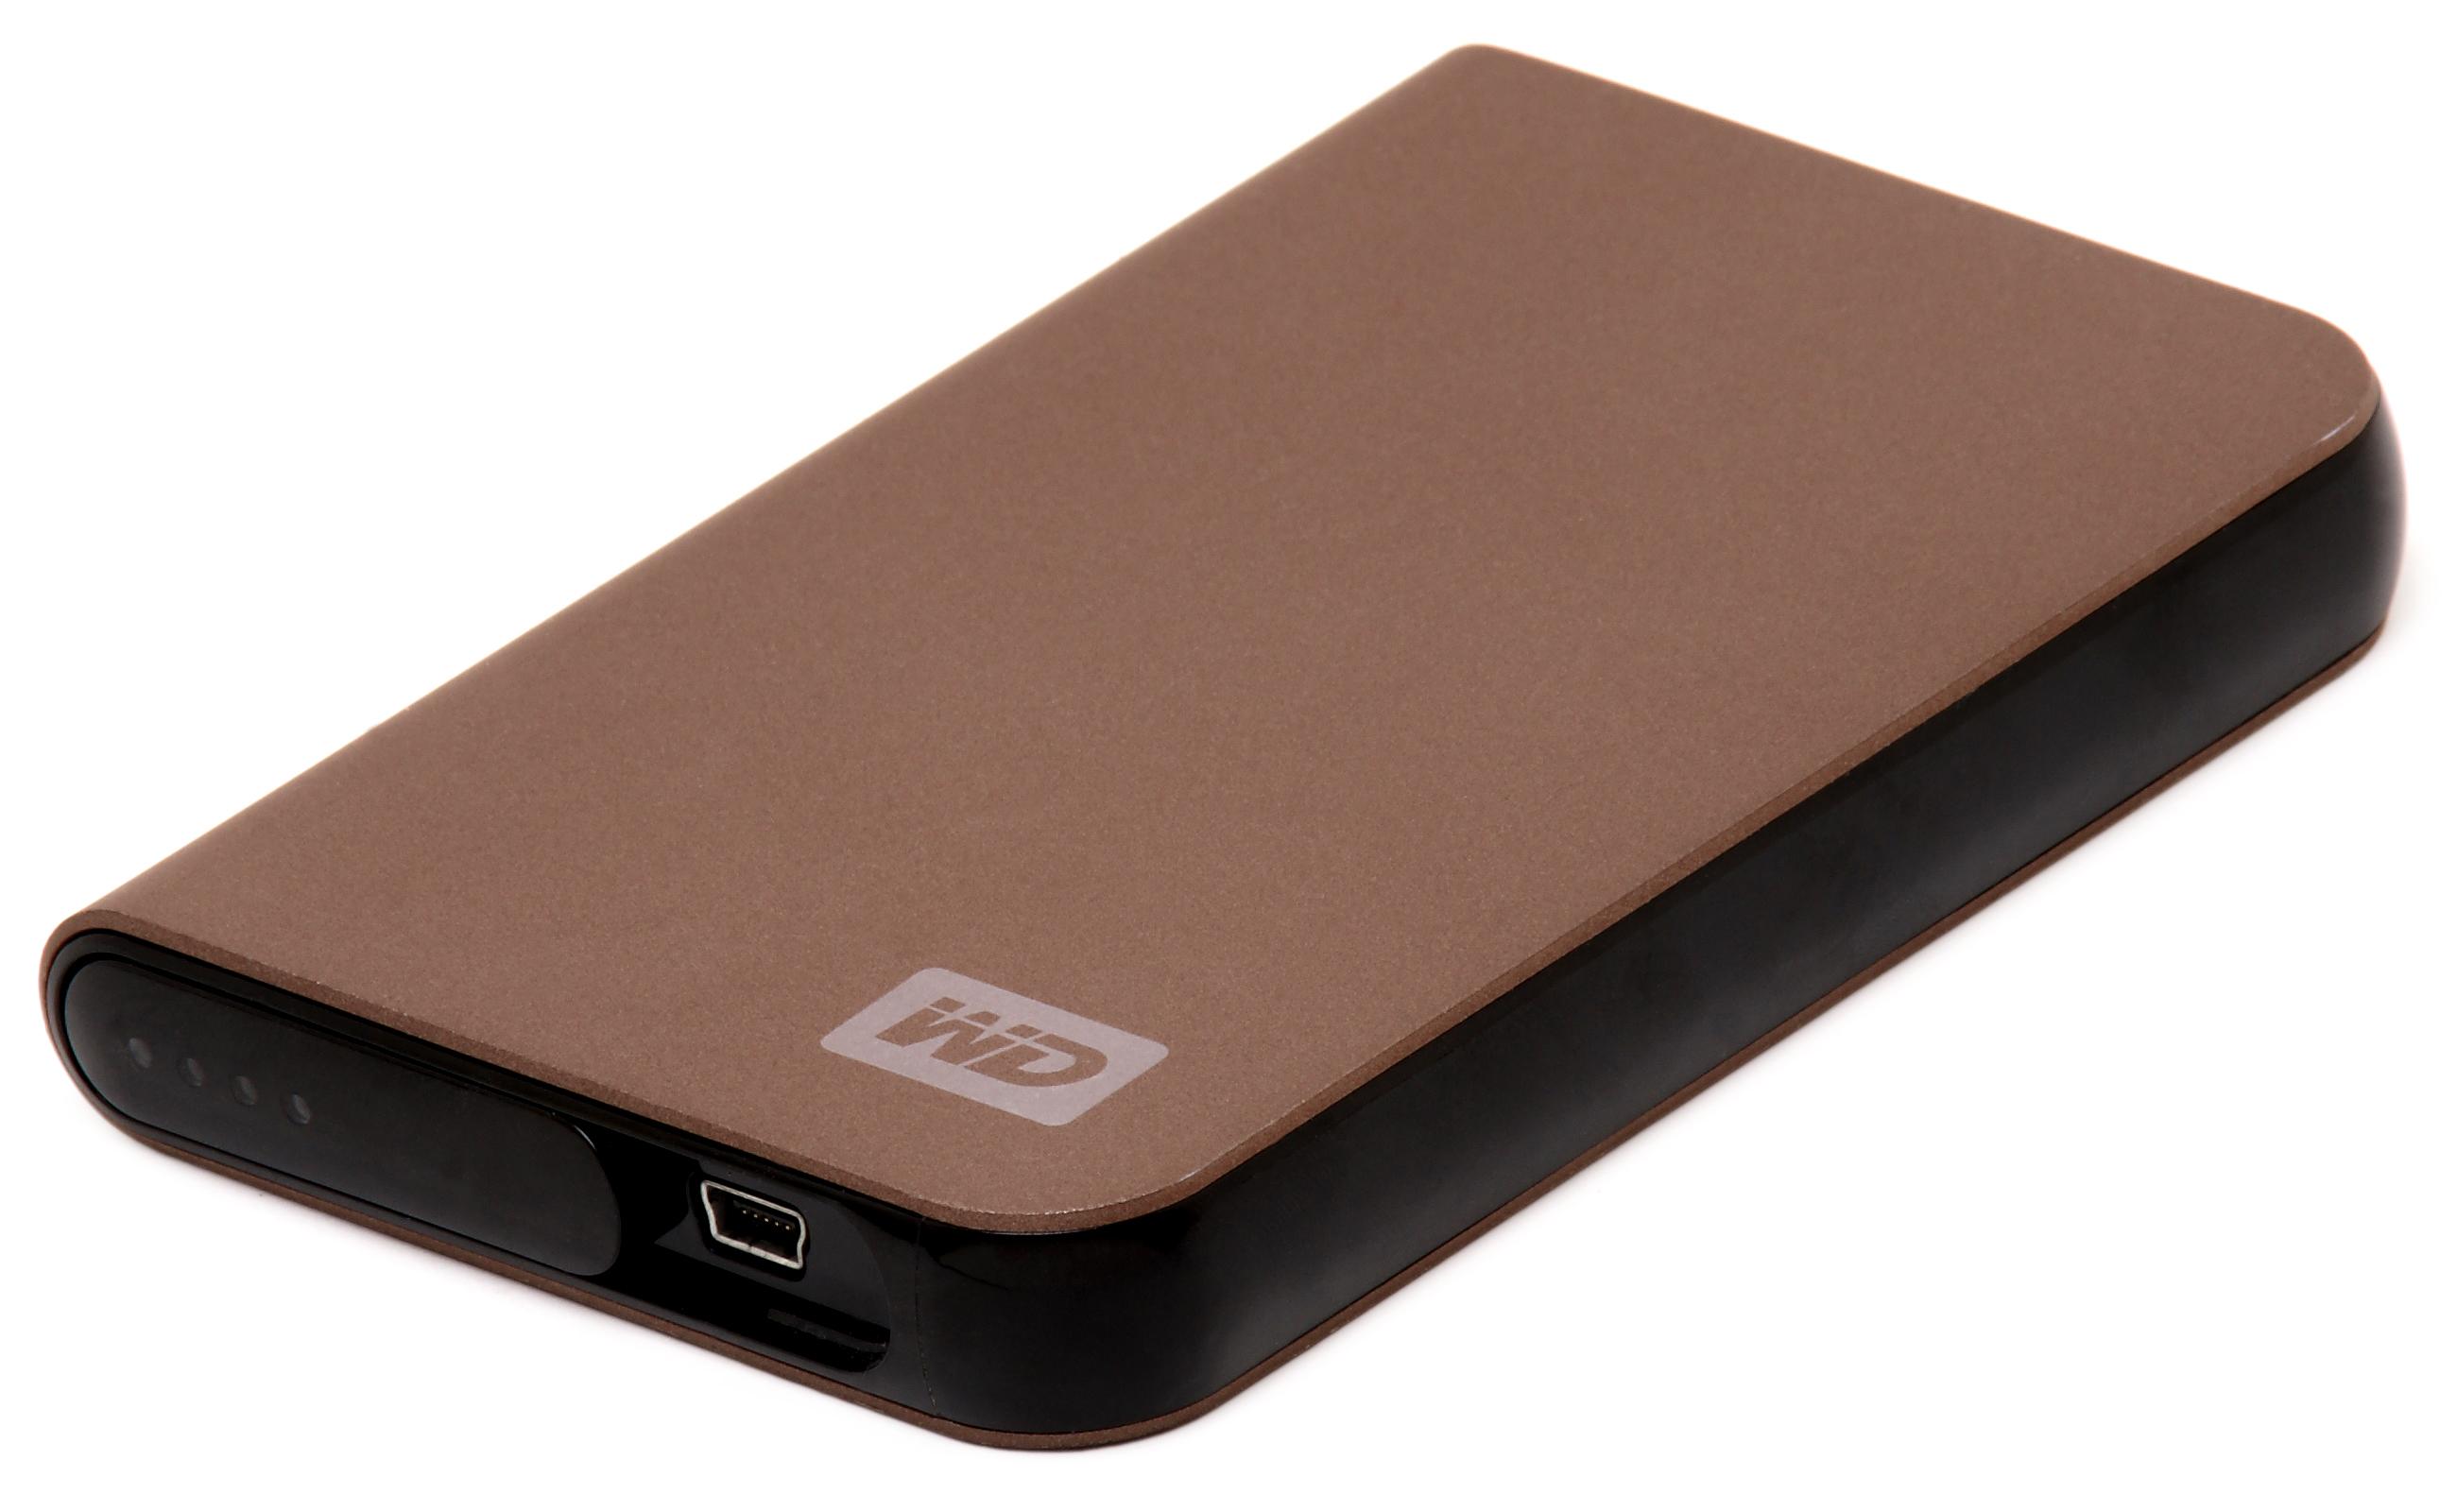 external image USB-Hard-Drive.jpg